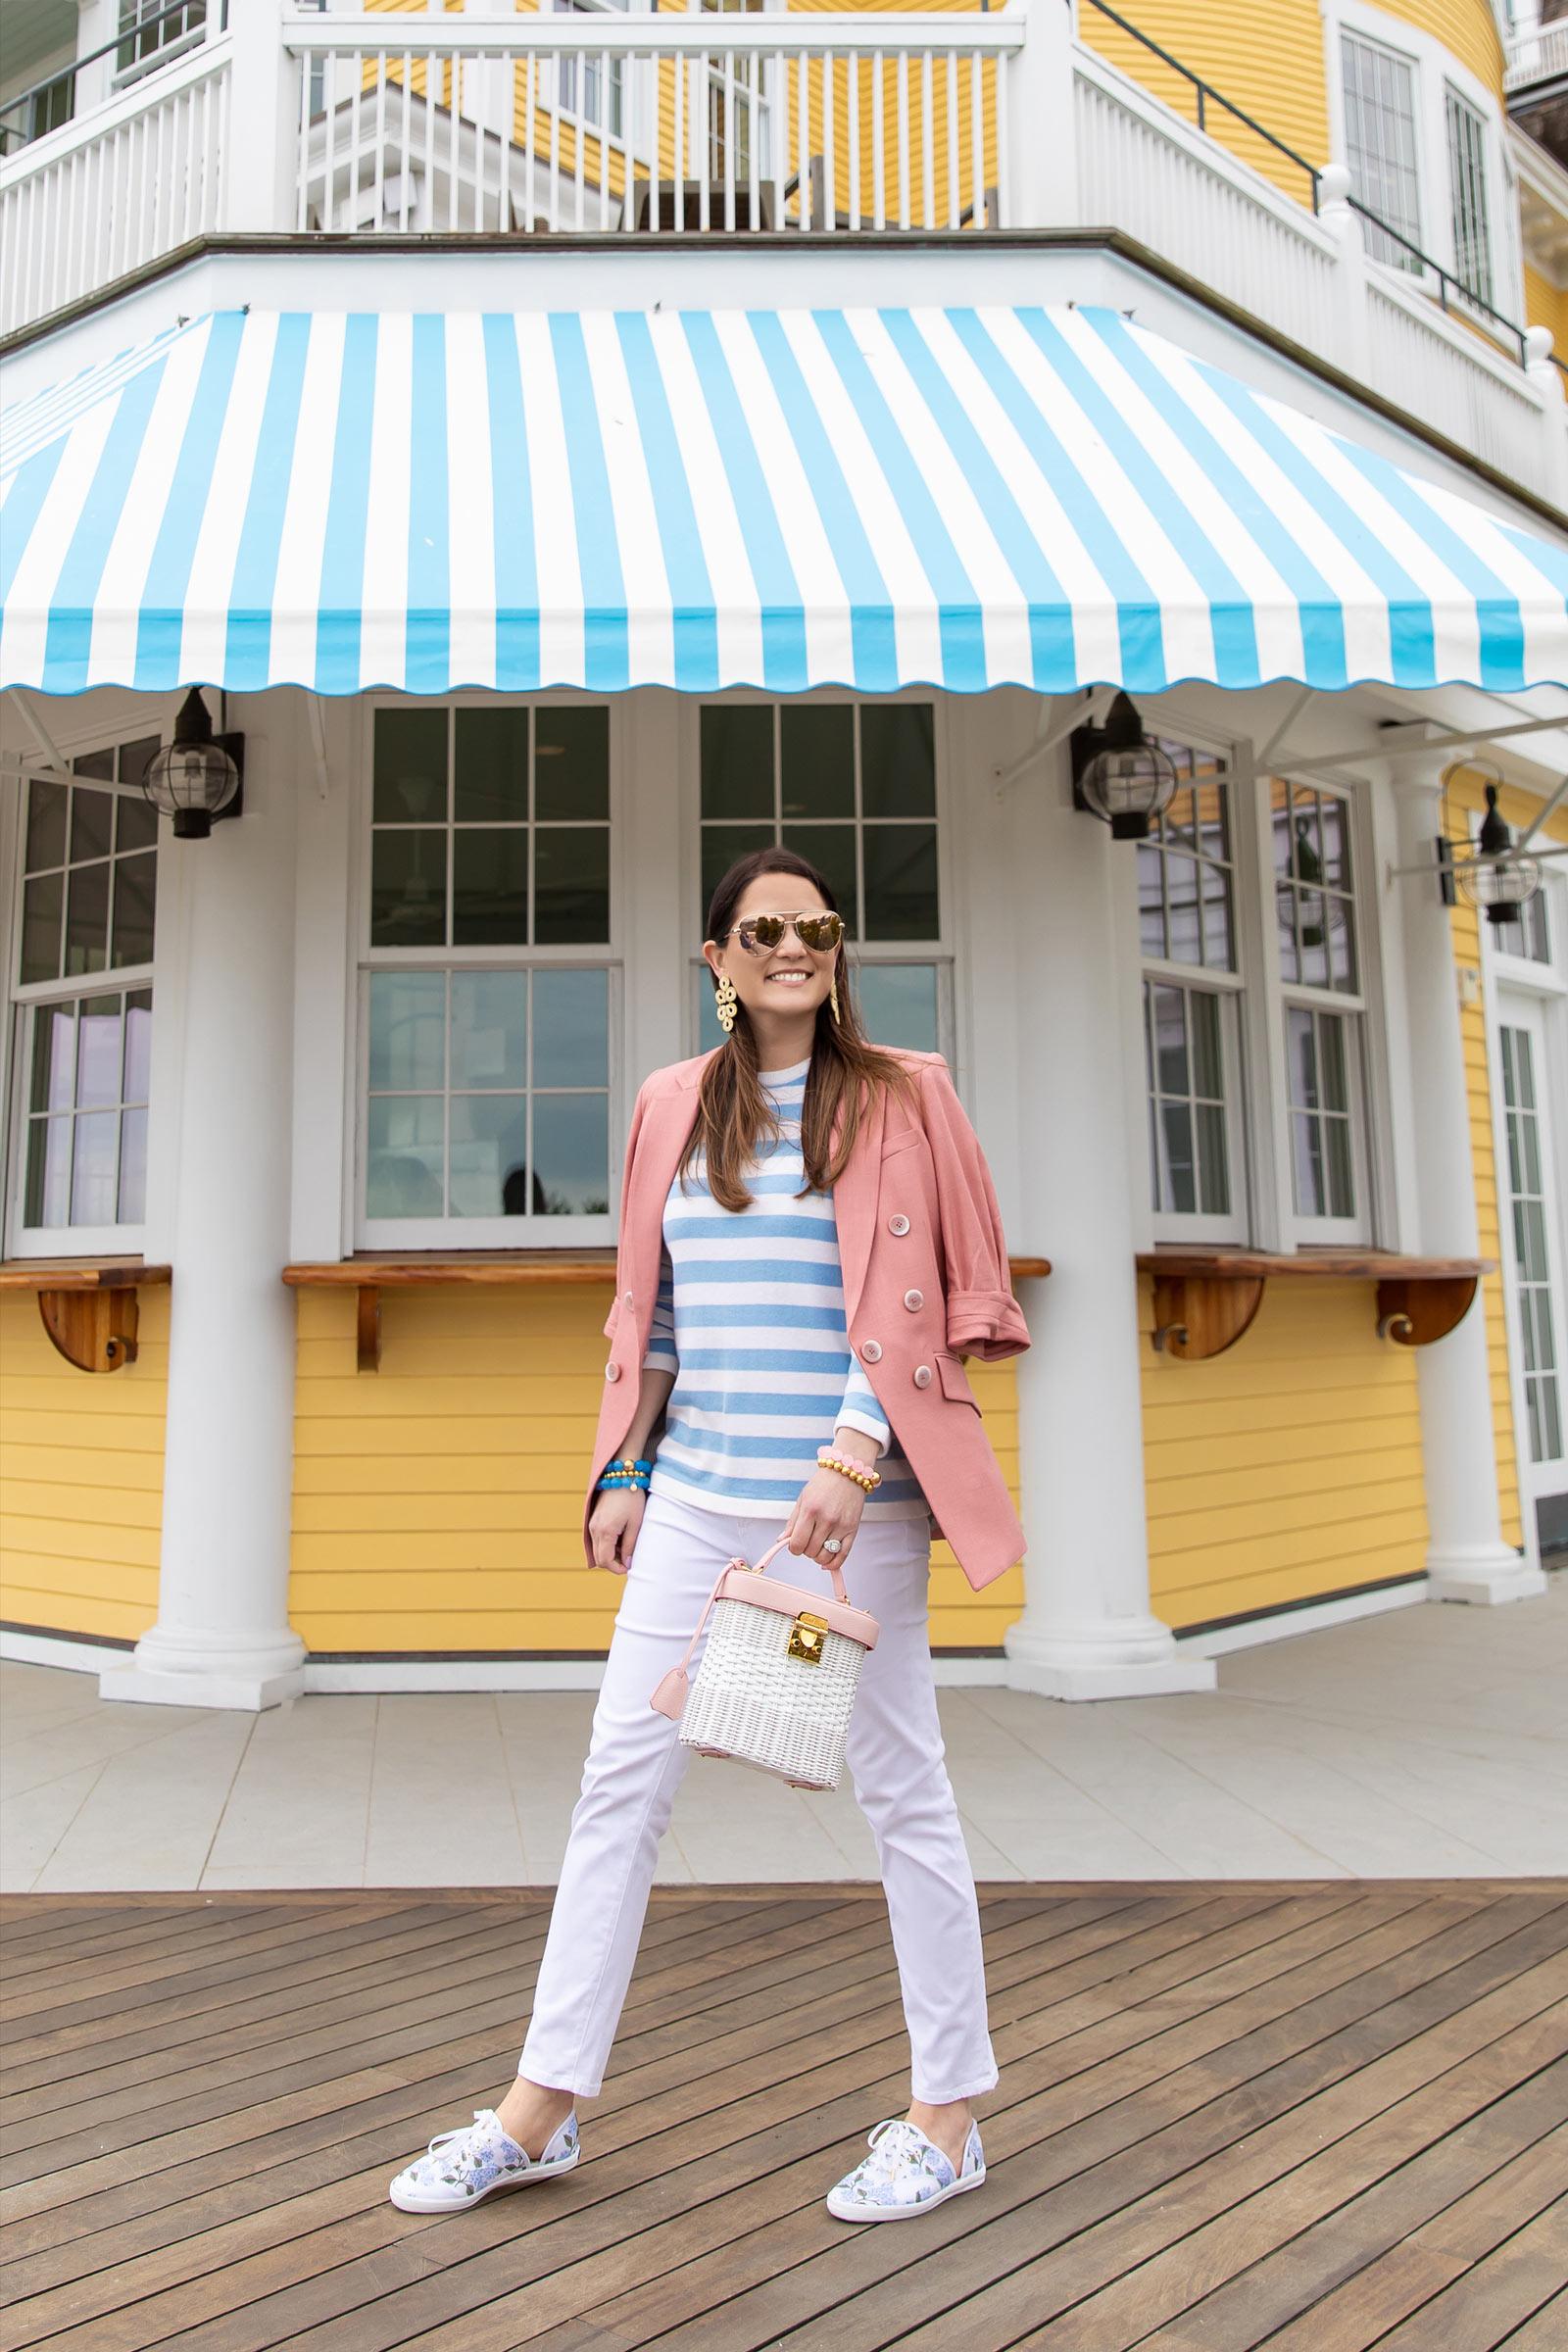 Sail to Sable Blue Stripe Sweater